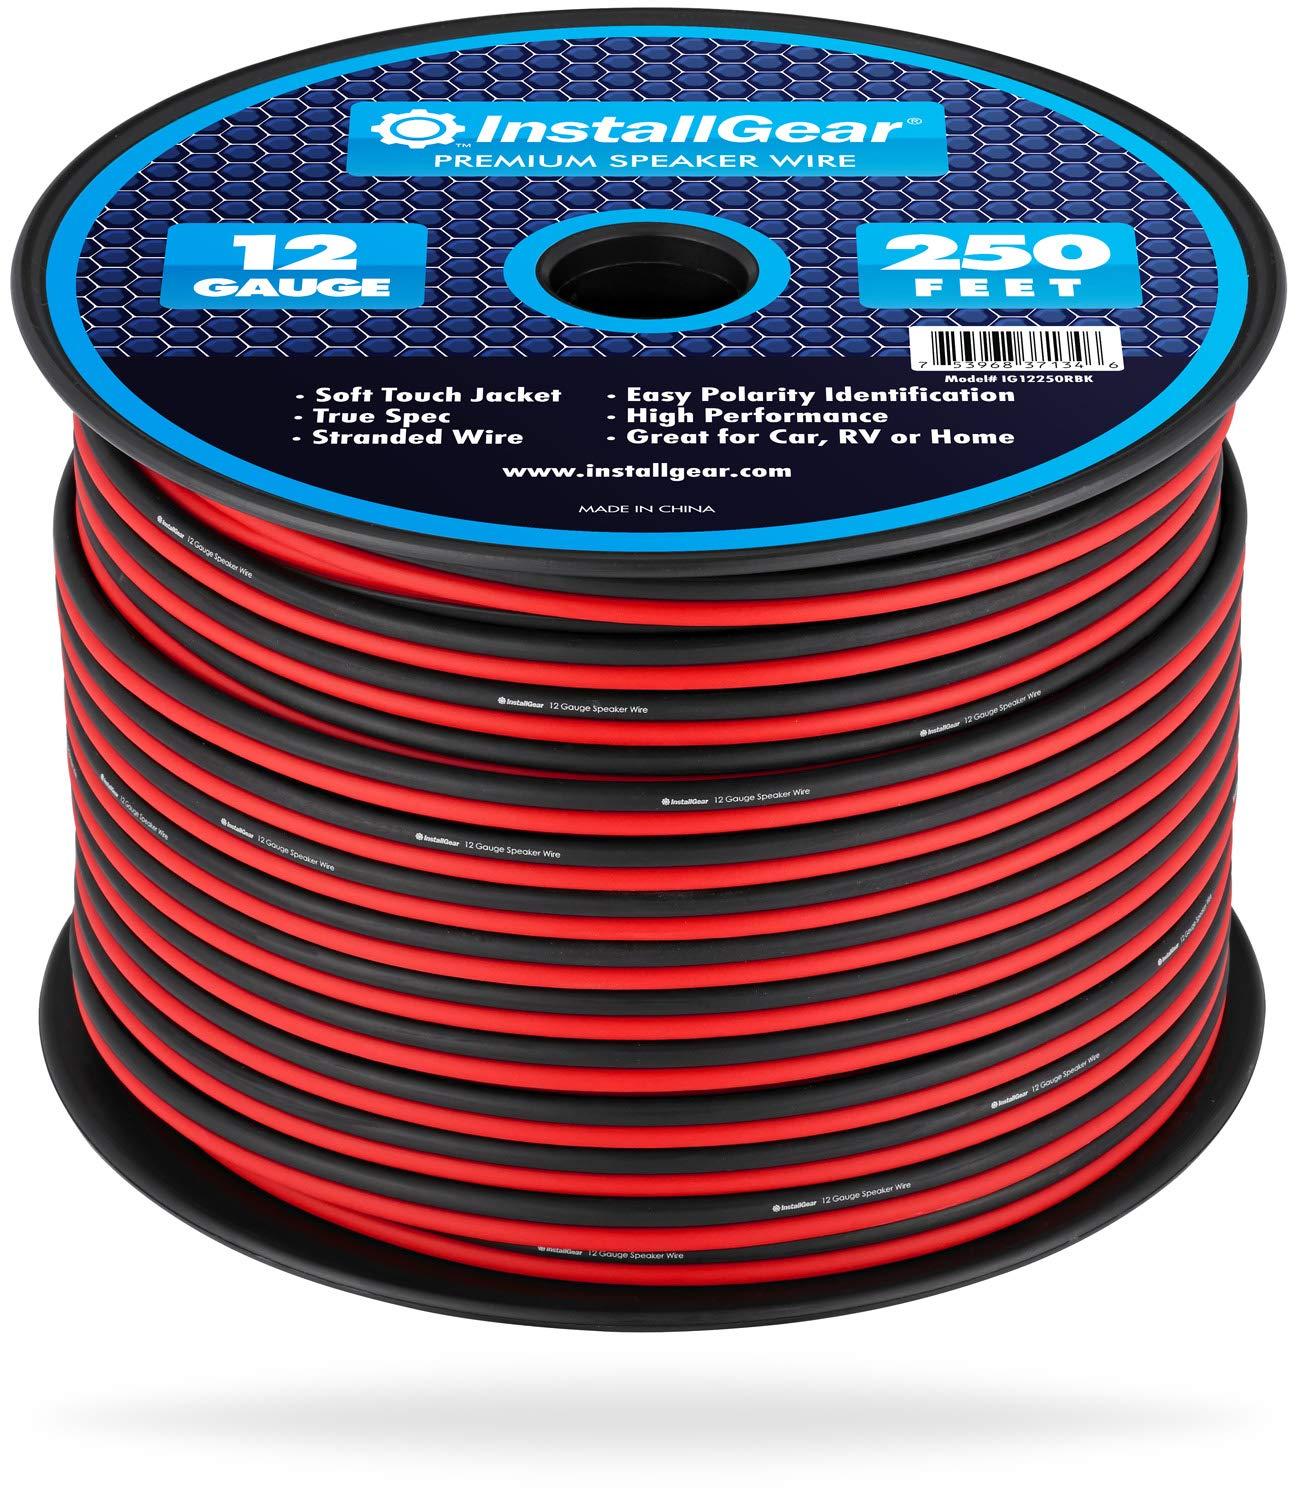 InstallGear 12 Gauge Speaker Wire (250-feet - Red/Black) by InstallGear